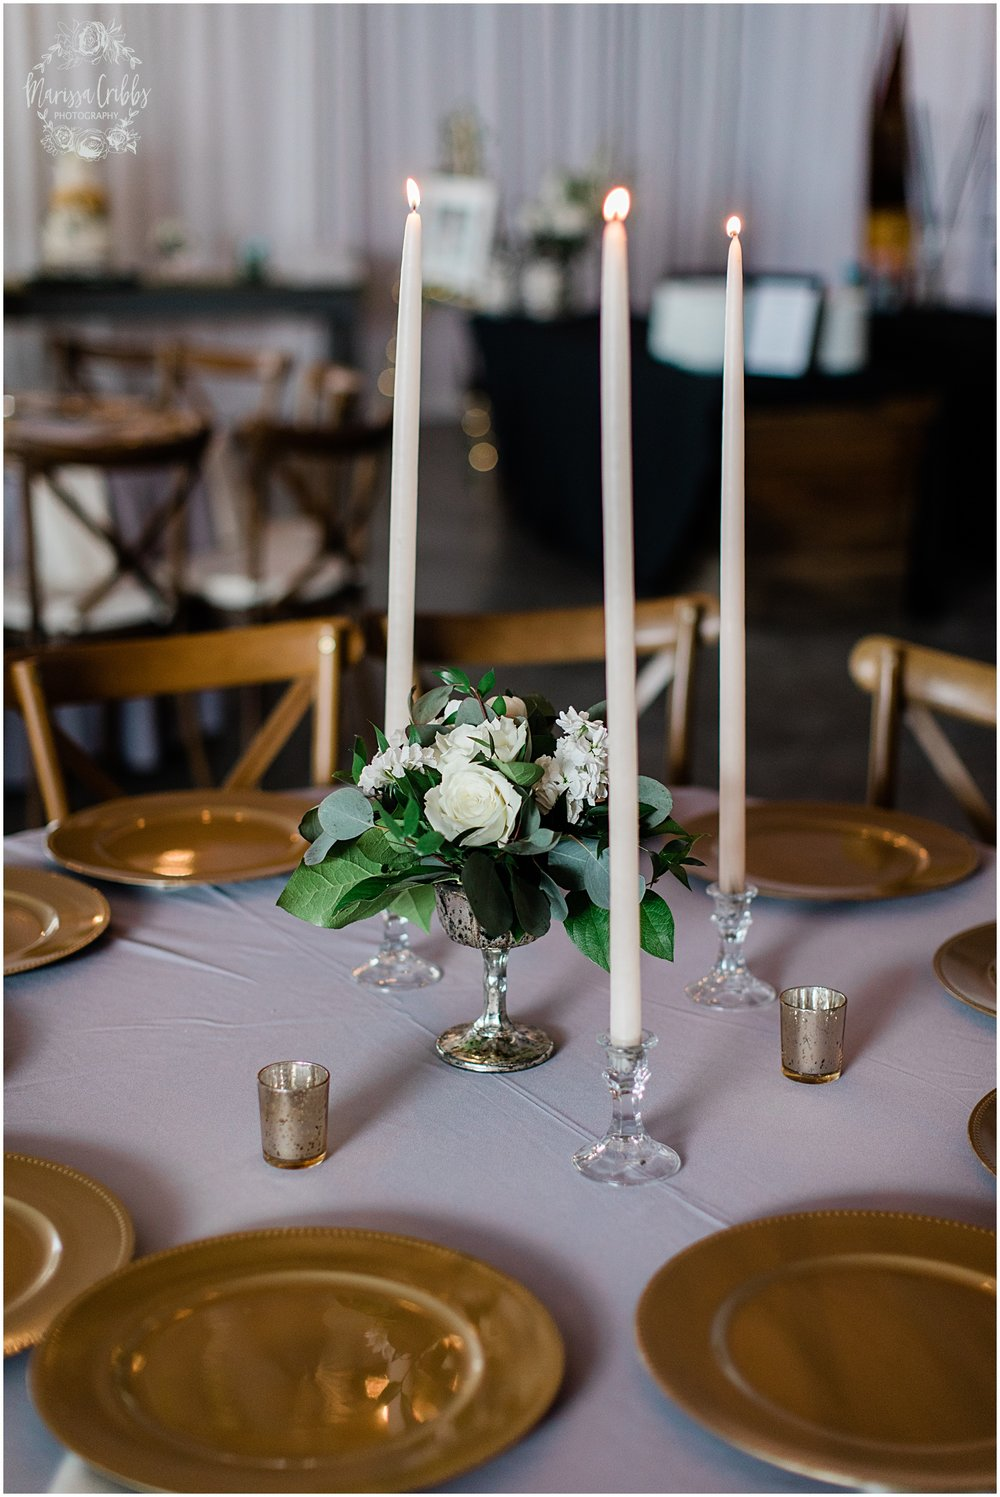 GORBY WEDDING | MARISSA CRIBBS PHOTOGRAPHY_5092.jpg